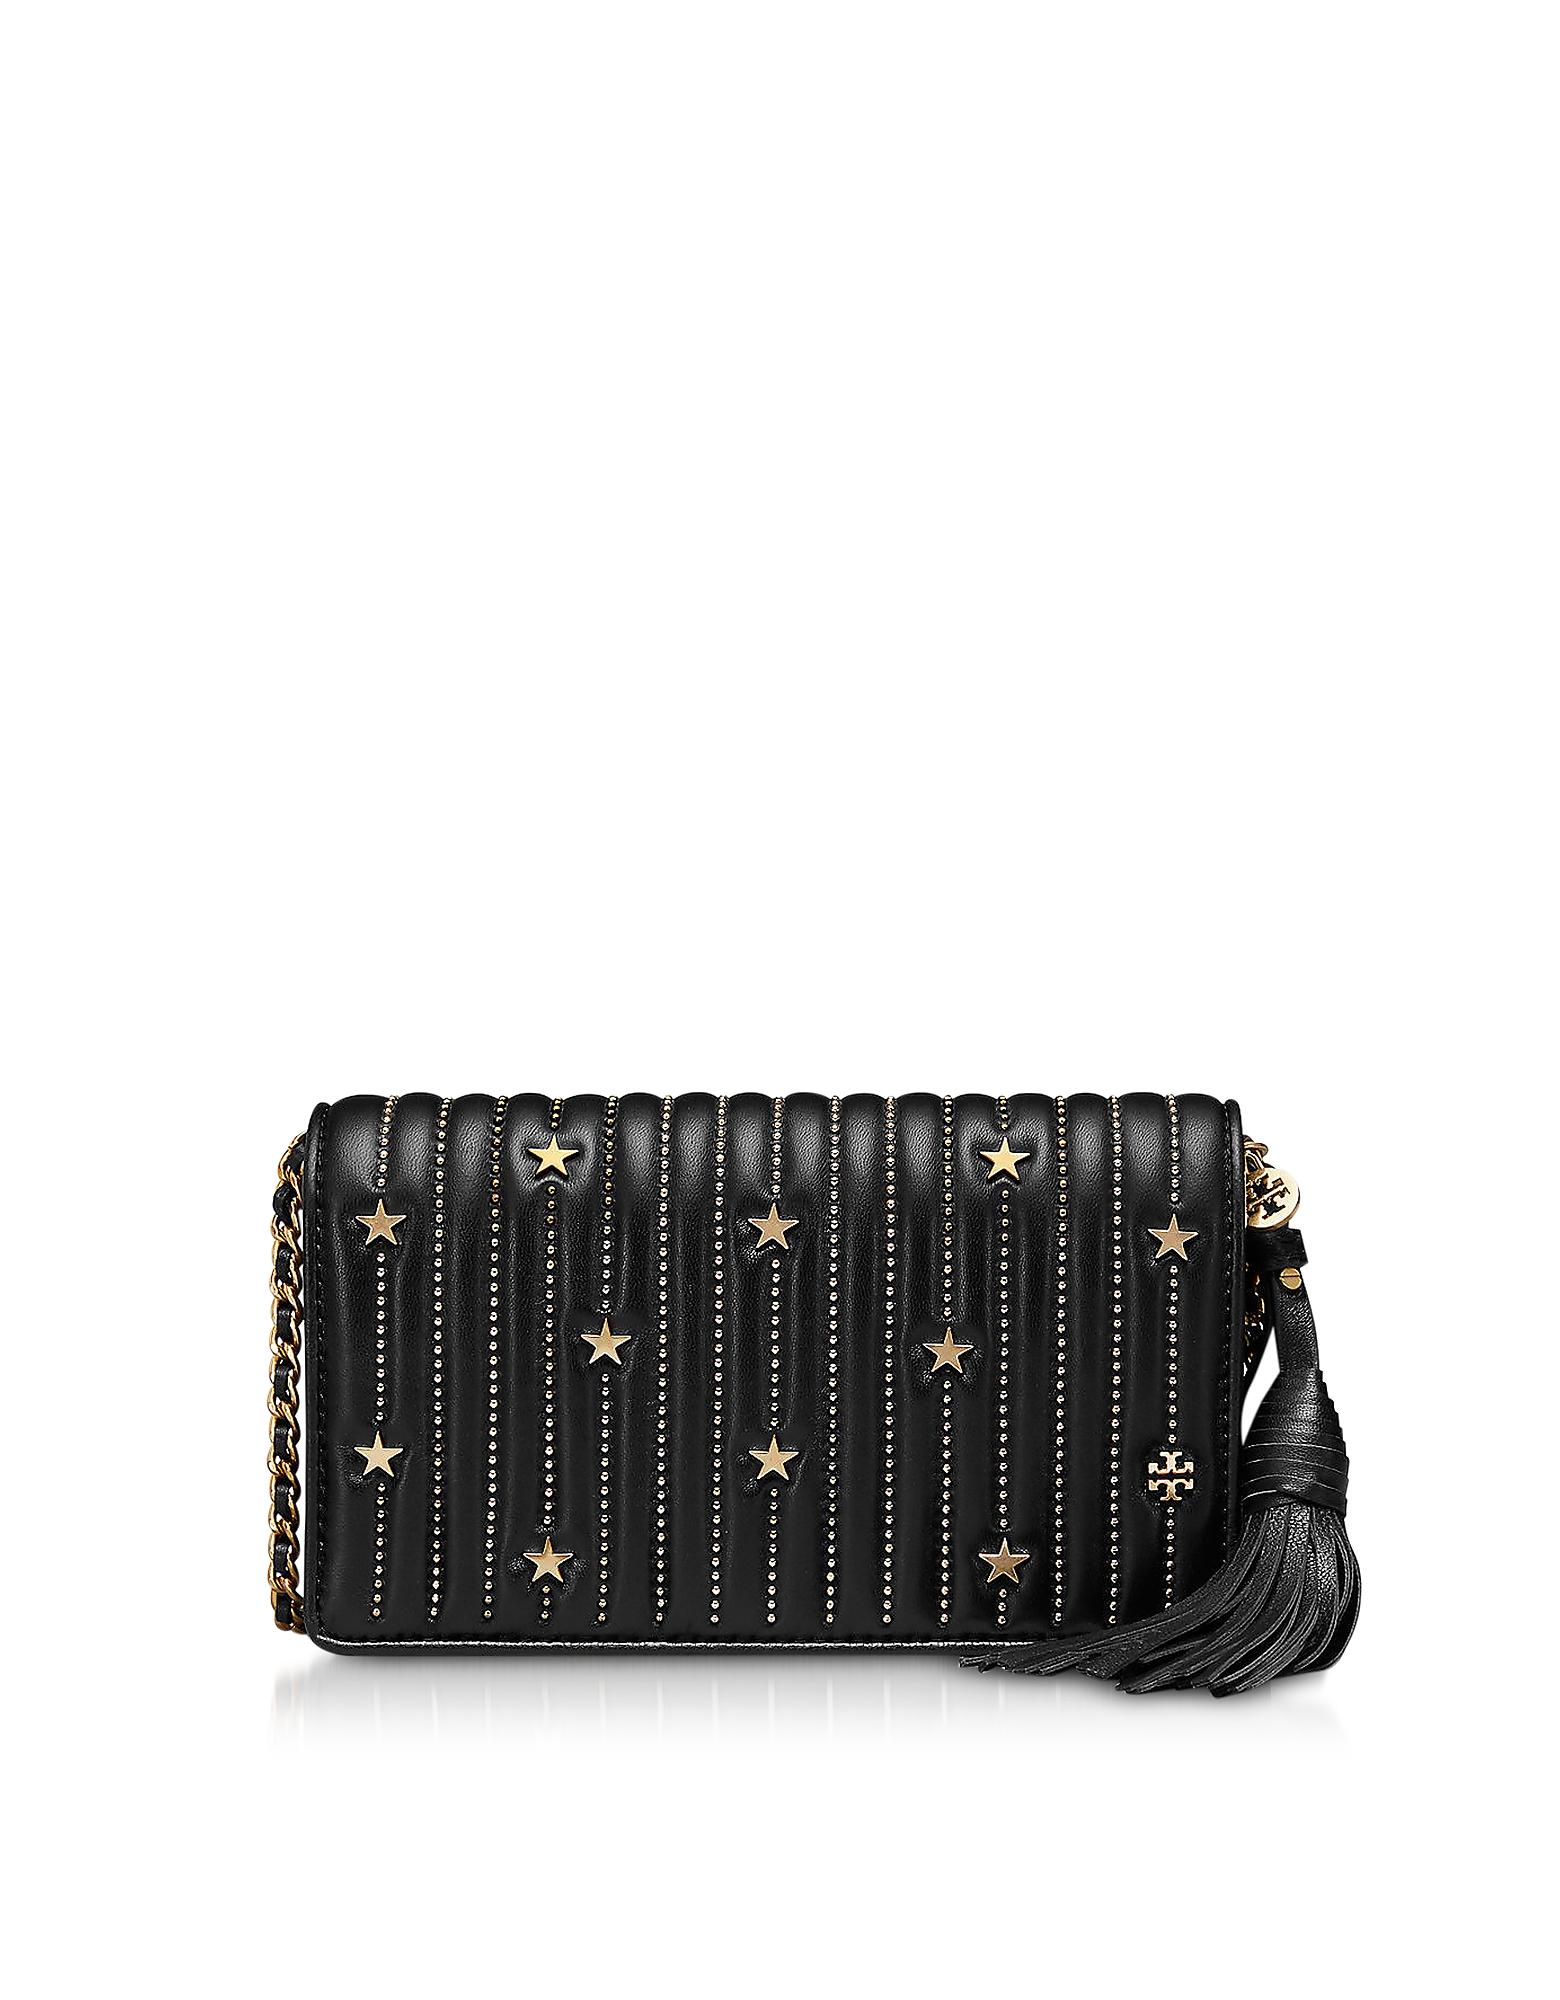 Tory Burch Handbags, Black Star Studs Flat Wallet Crossbody Bag